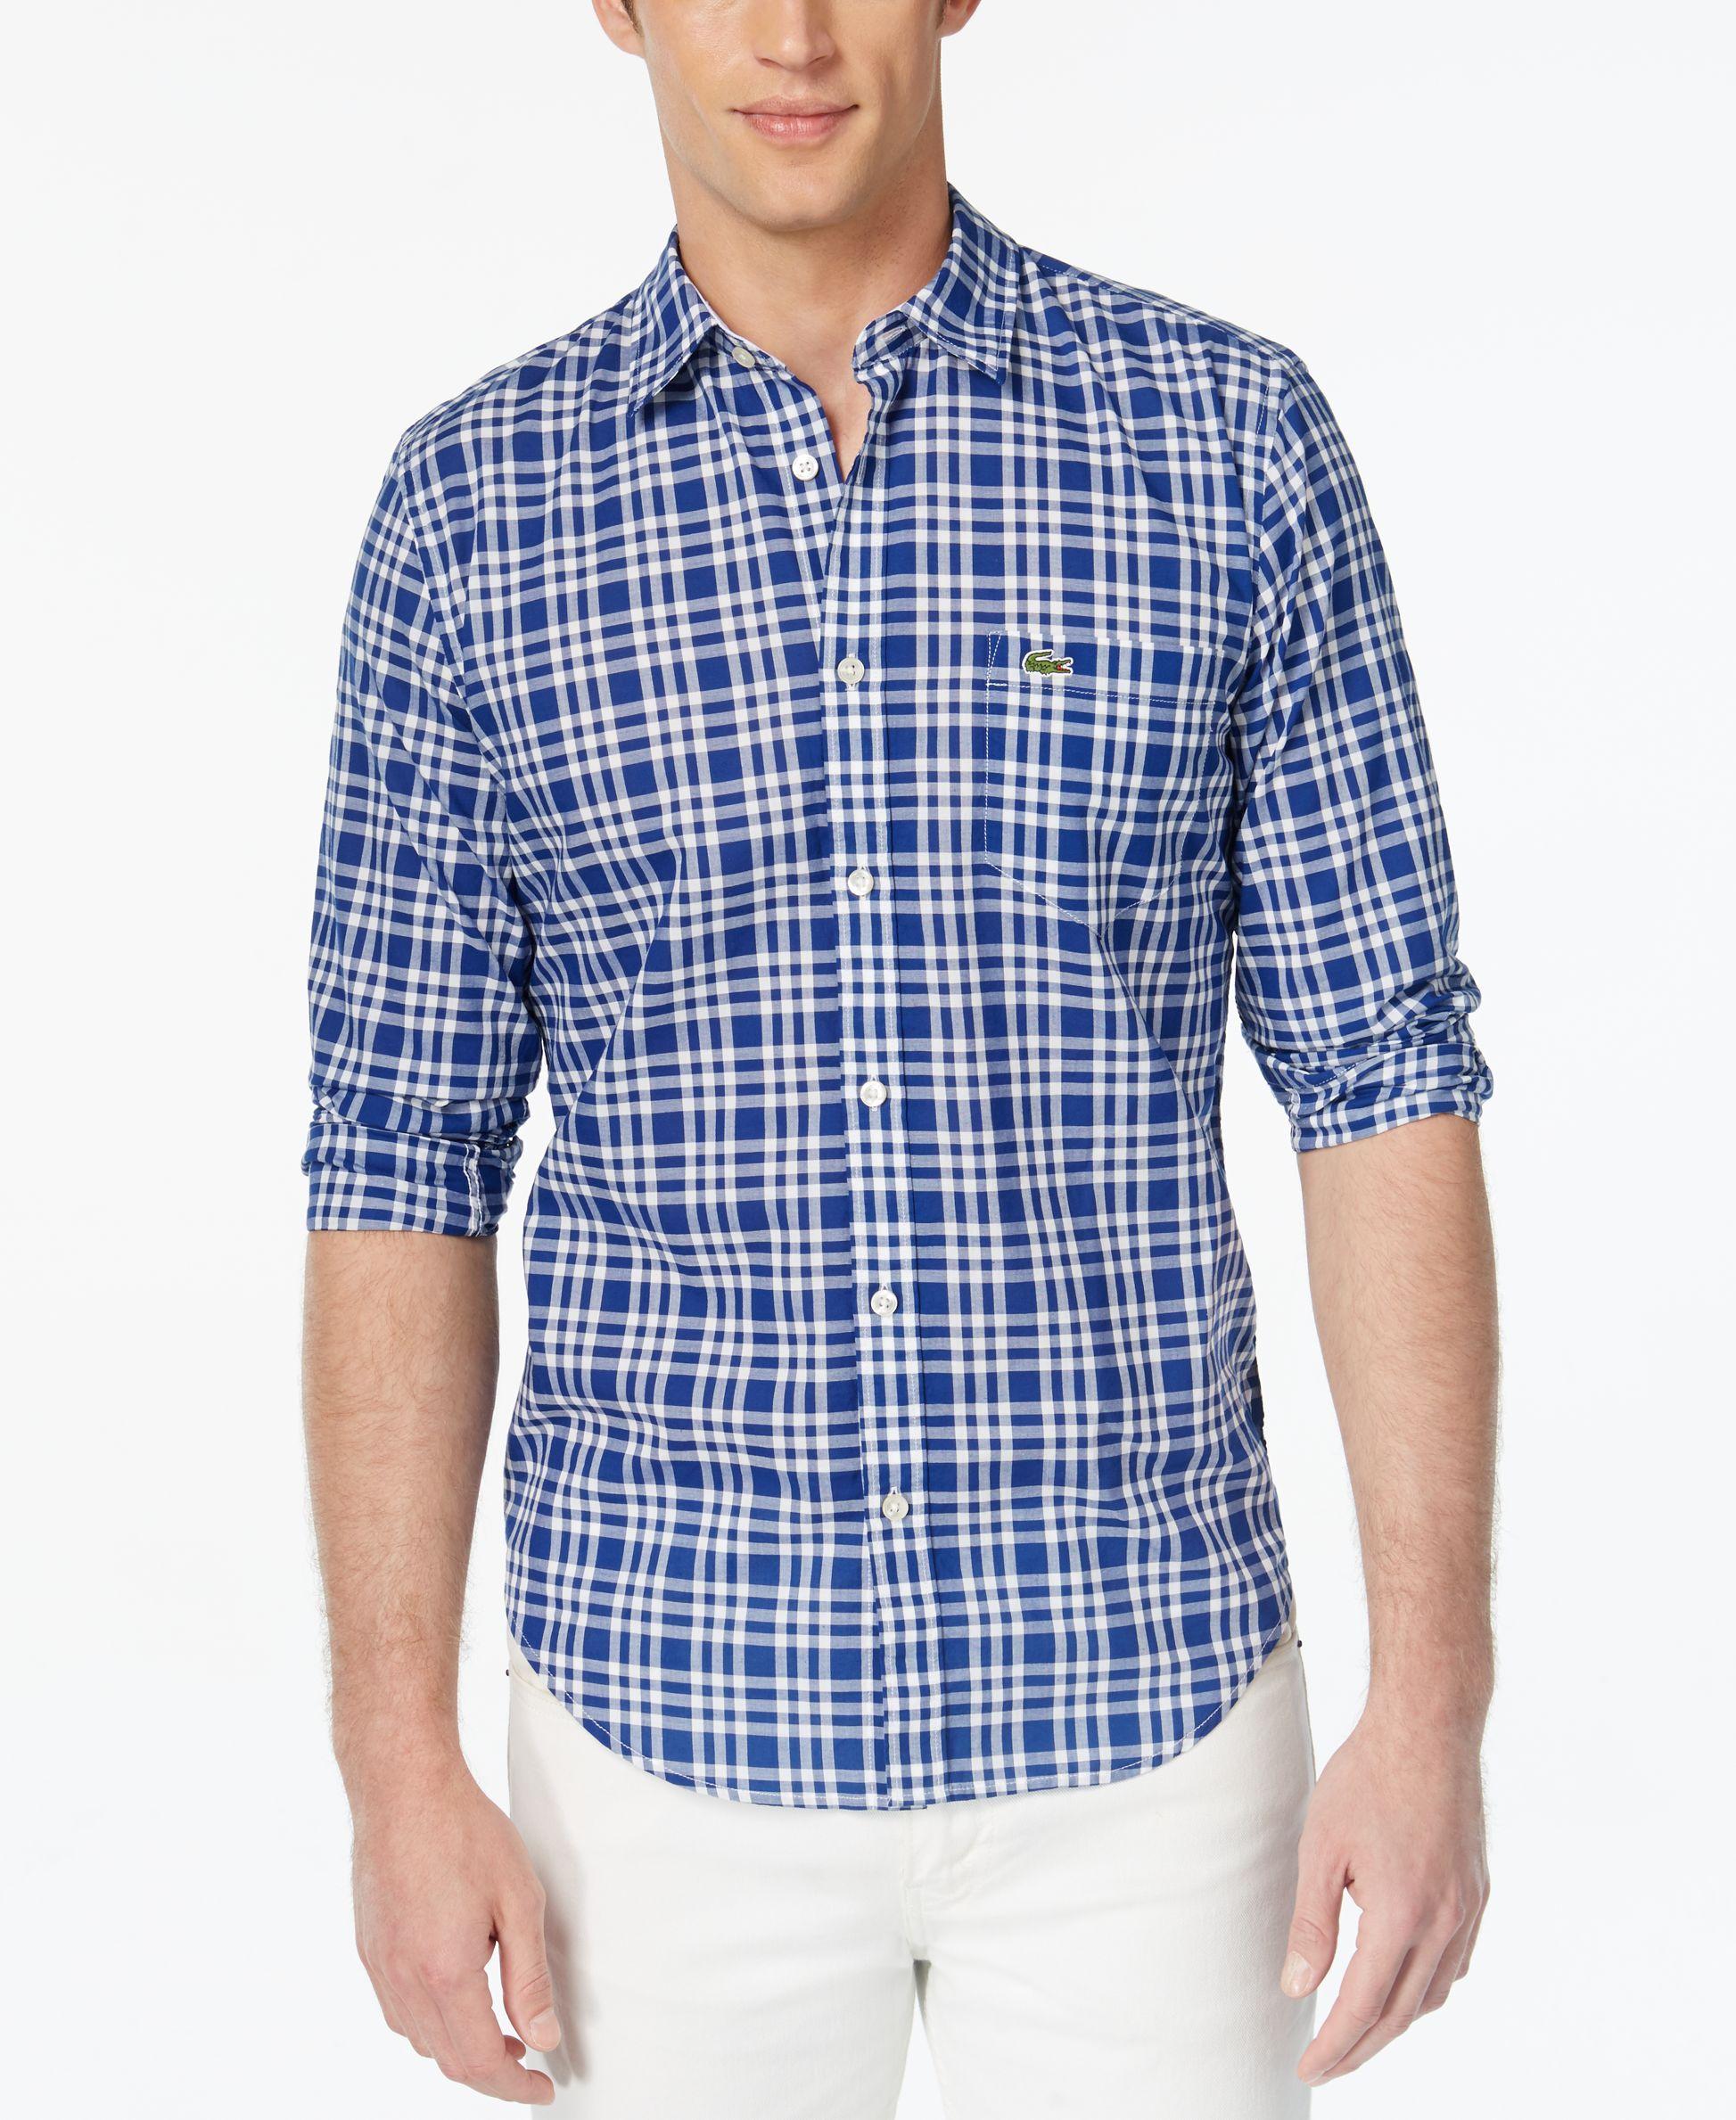 7817bfd53d Lacoste Men's Check Poplin Long-Sleeve Shirt | Stuff to buy ...